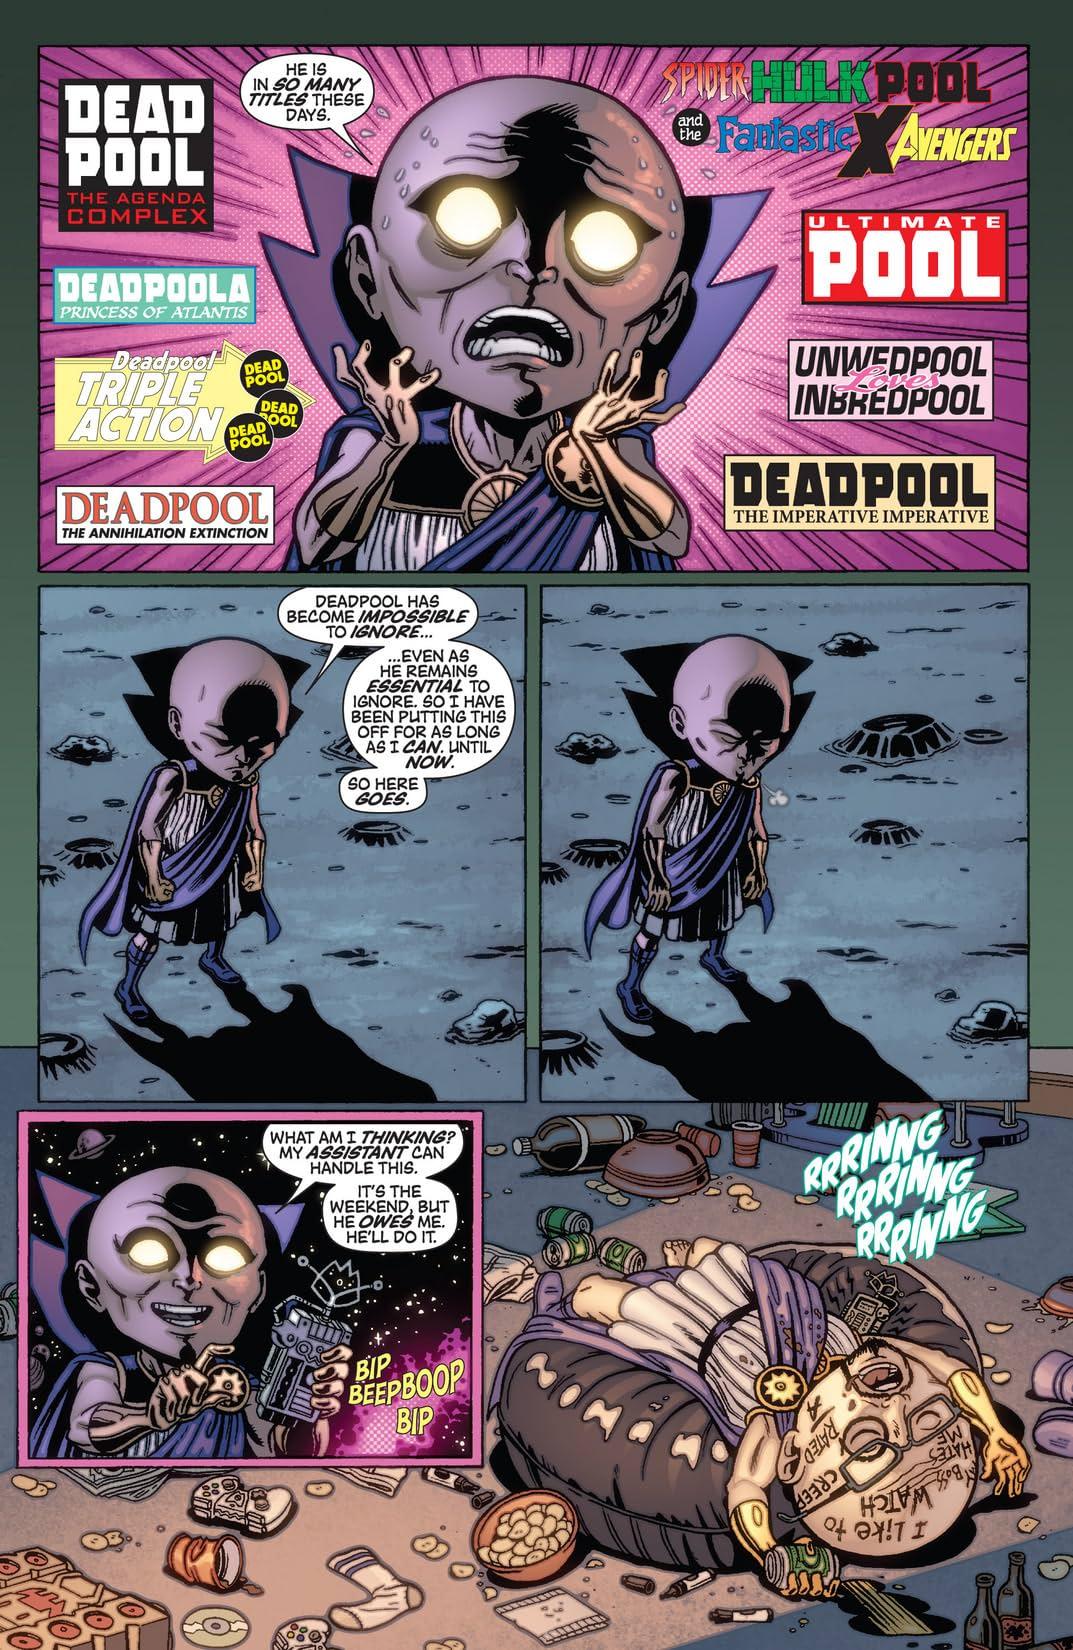 Deadpool Team-Up #884